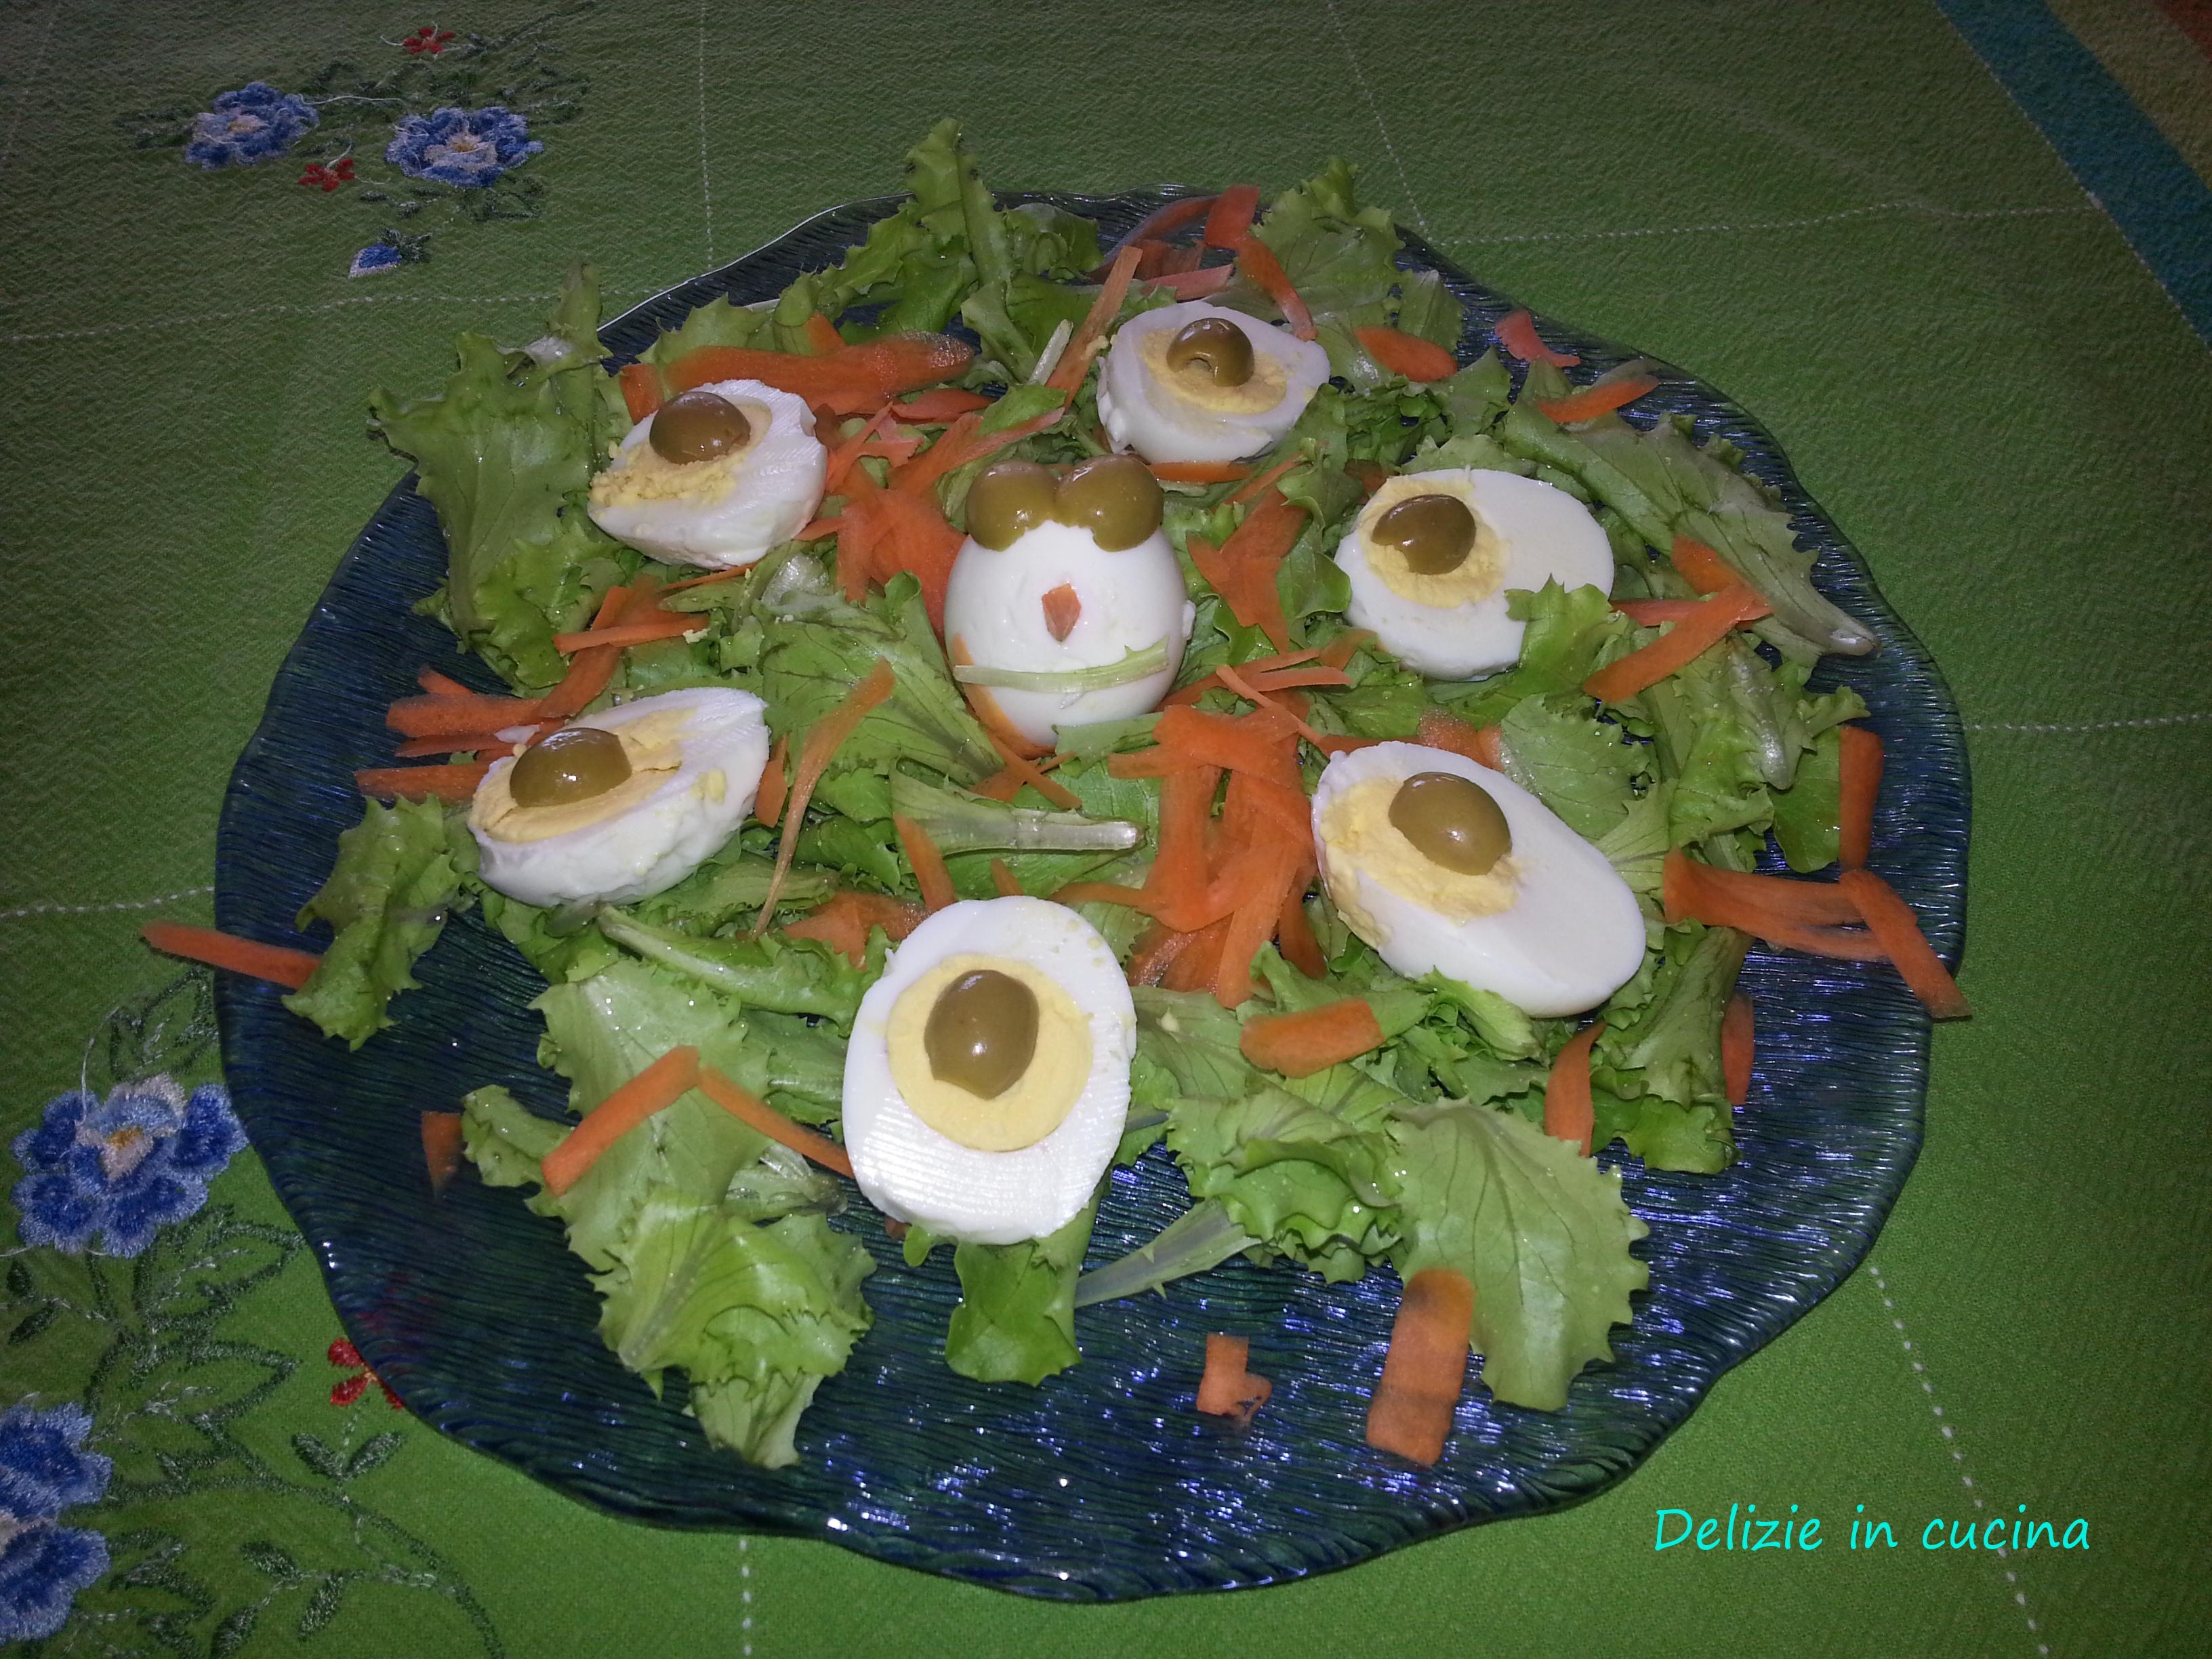 Uova sode divertenti delizie in cucina for Cucinare uova sode